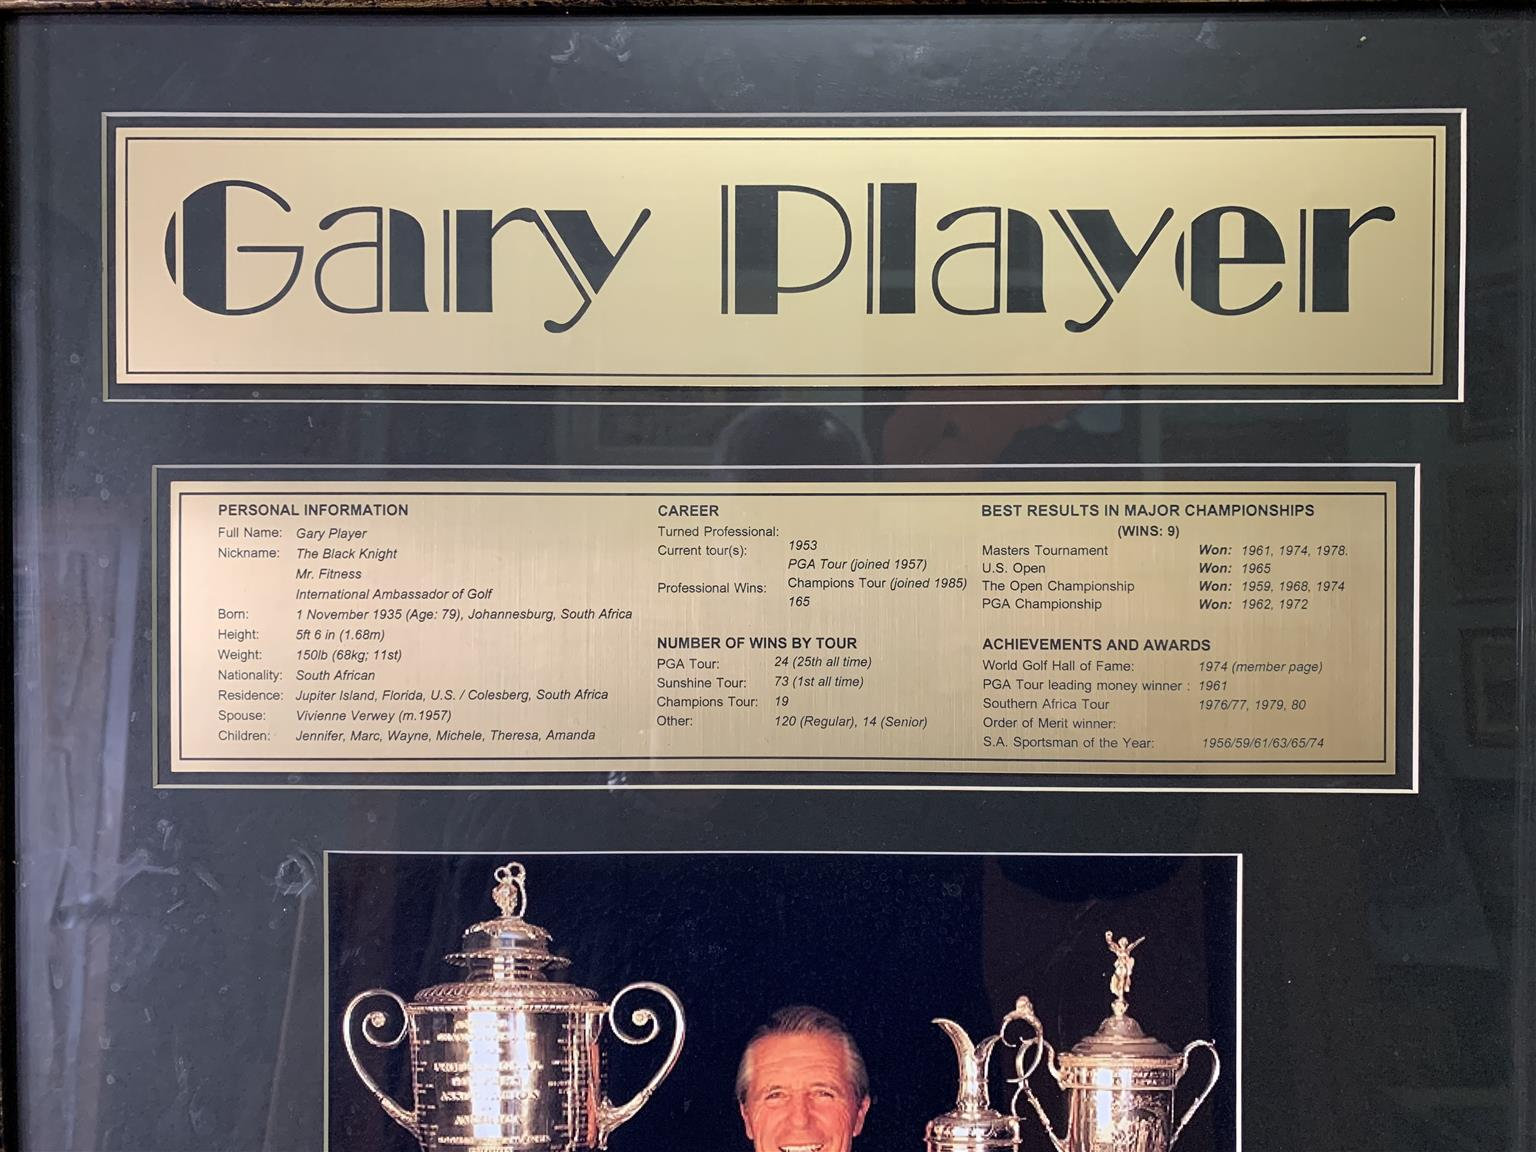 Gary Player limited edition memorabilia